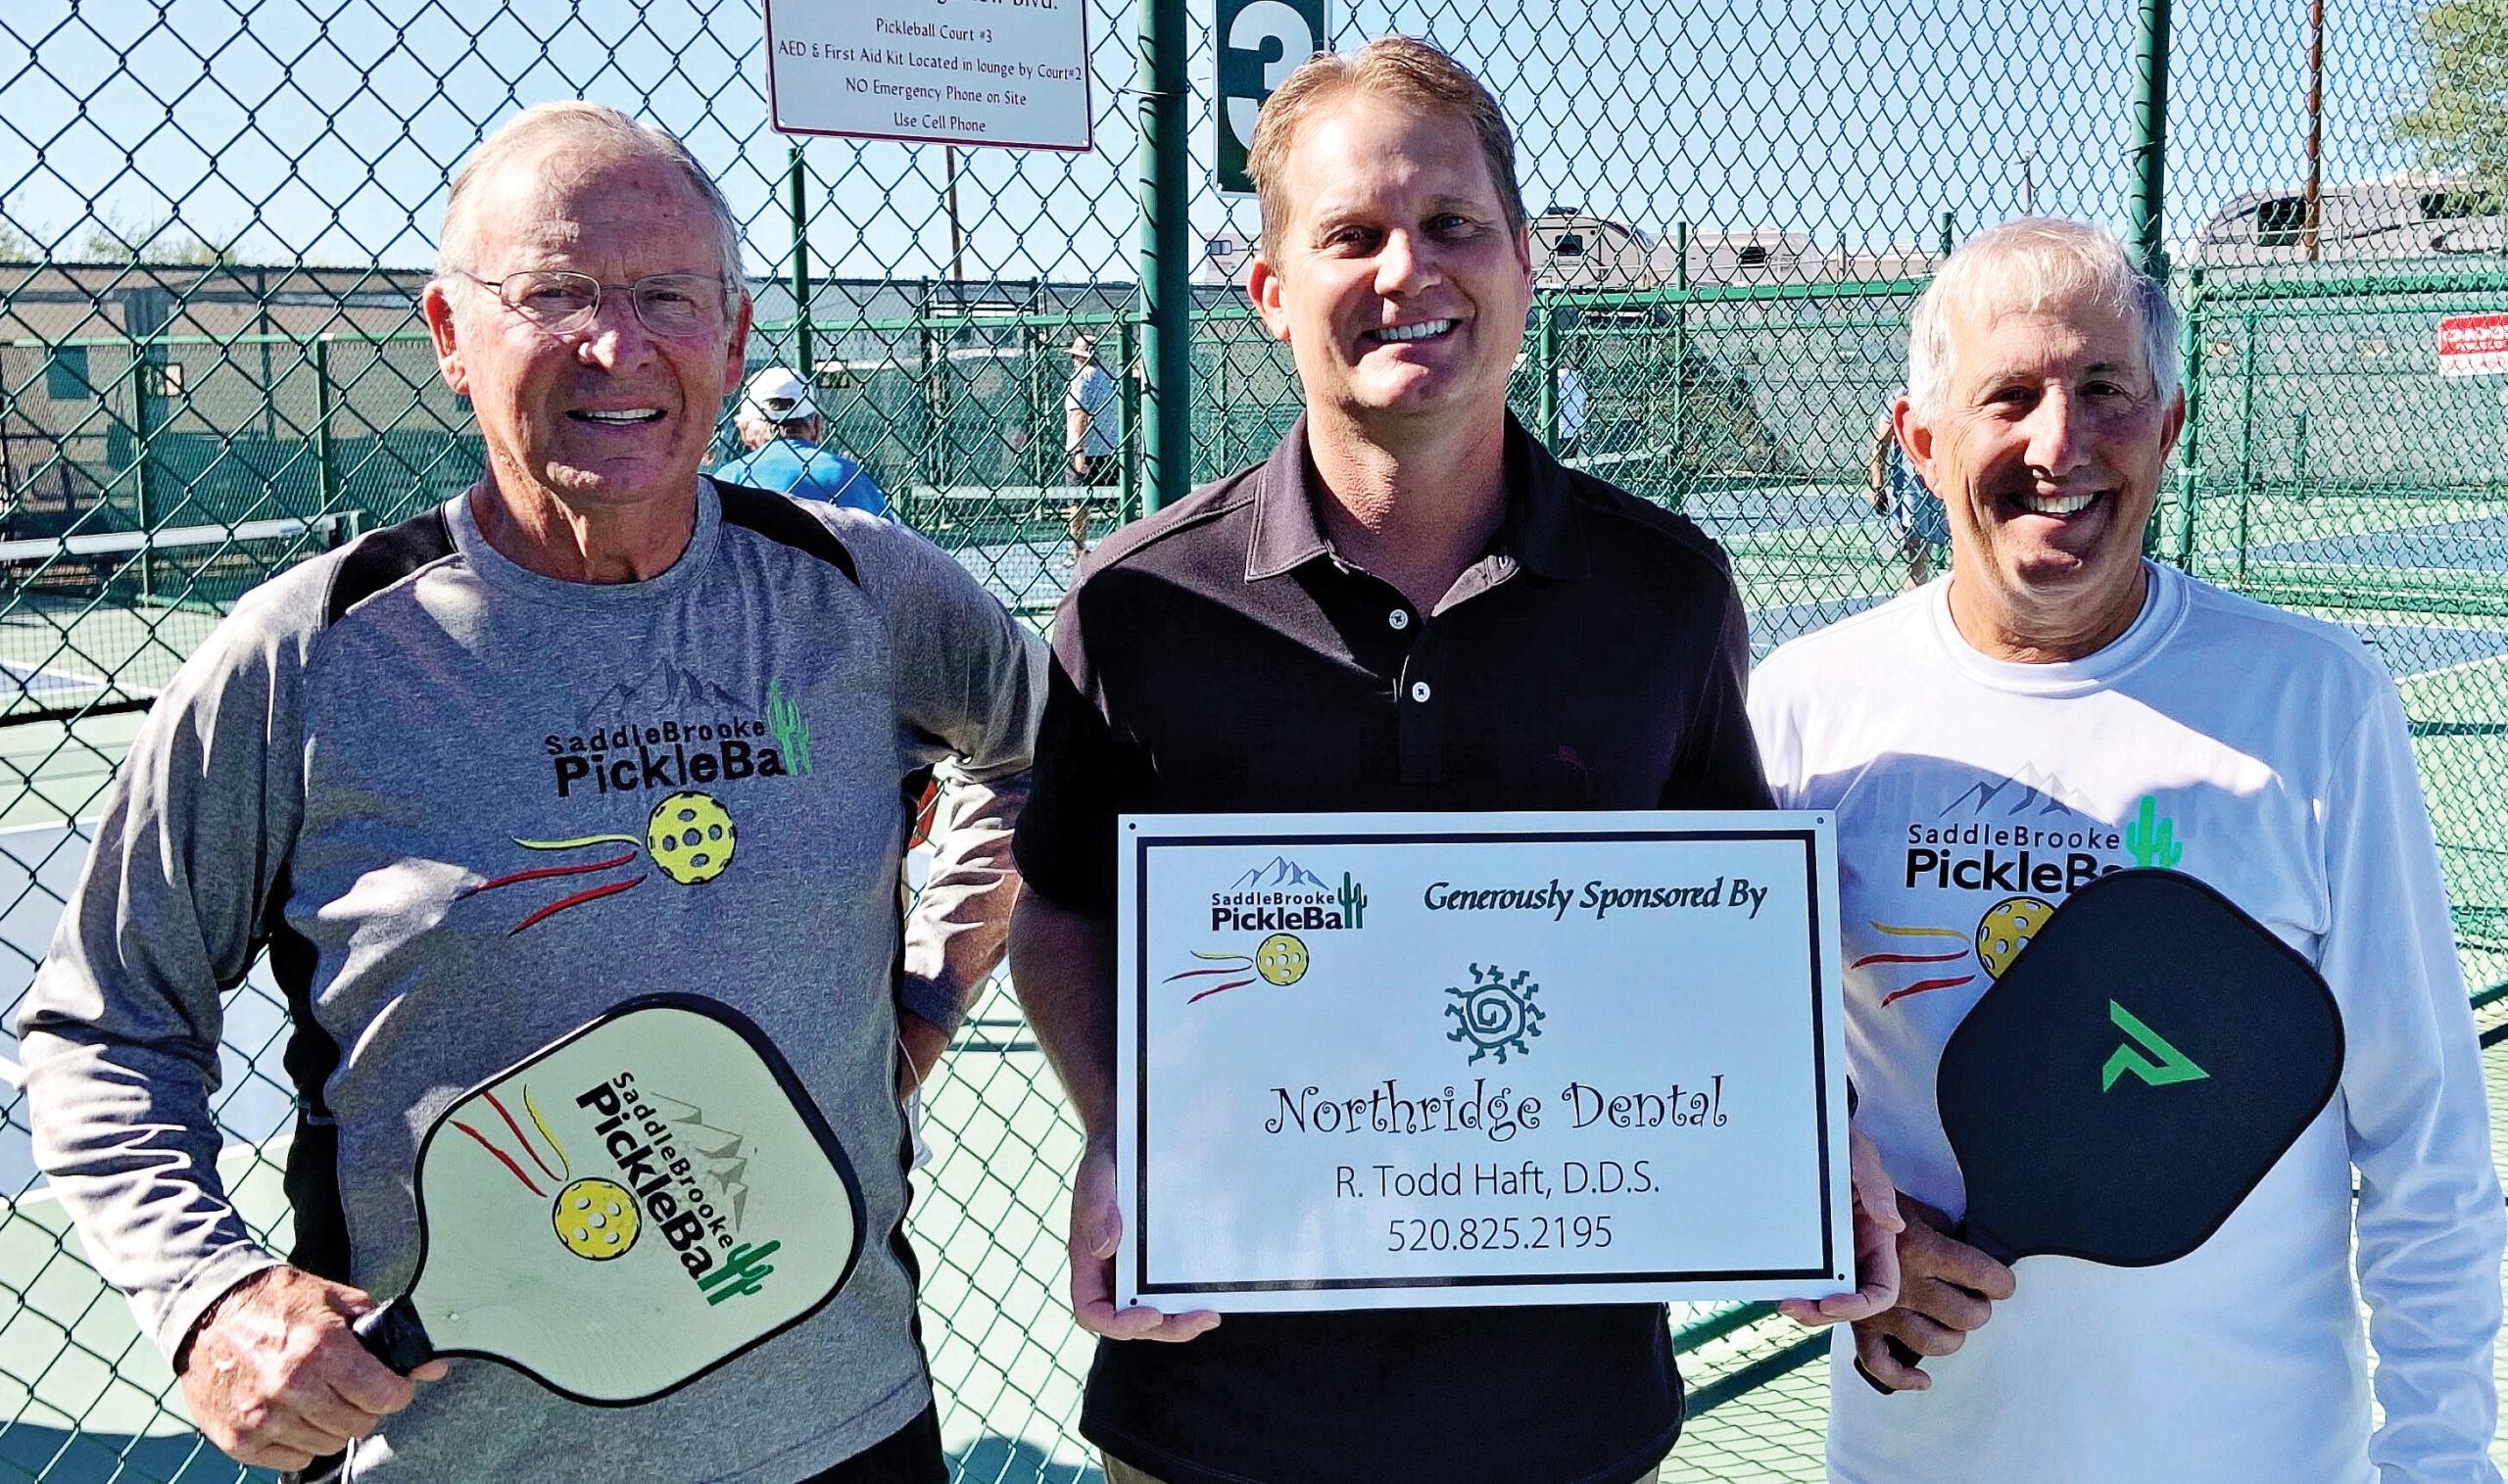 SPA member Bob Shelton, Dr. Todd Haft, and SPA president Peter Giljohann